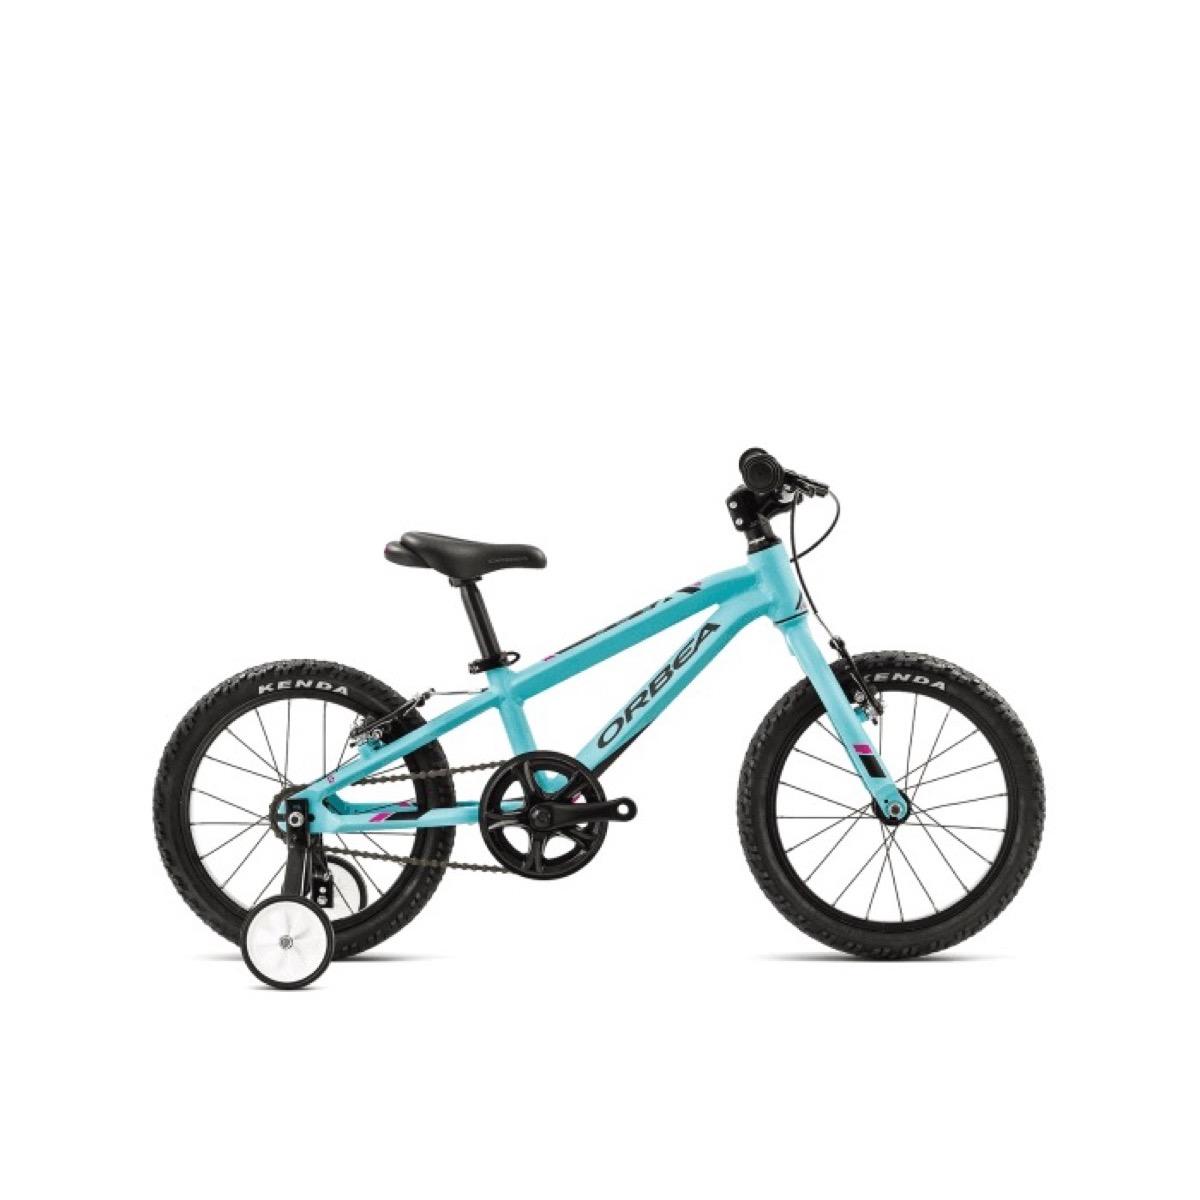 Orbea MX 16 Blau